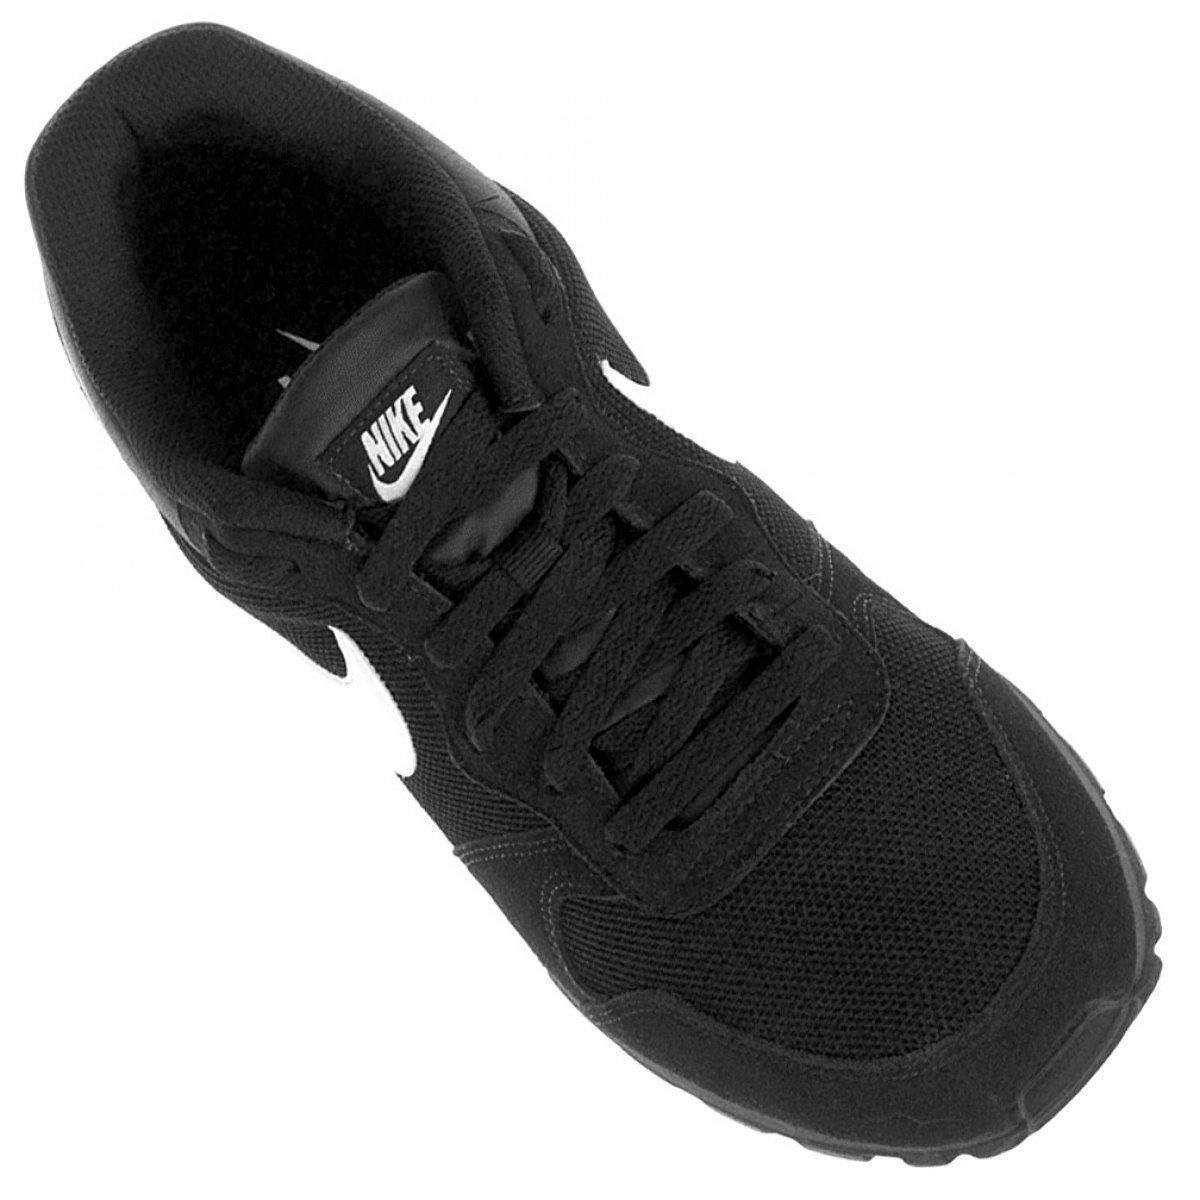 716ac685992a0 Tênis Nike Md Runner 2 Preto e Branco Masculino - Compre Agora ...